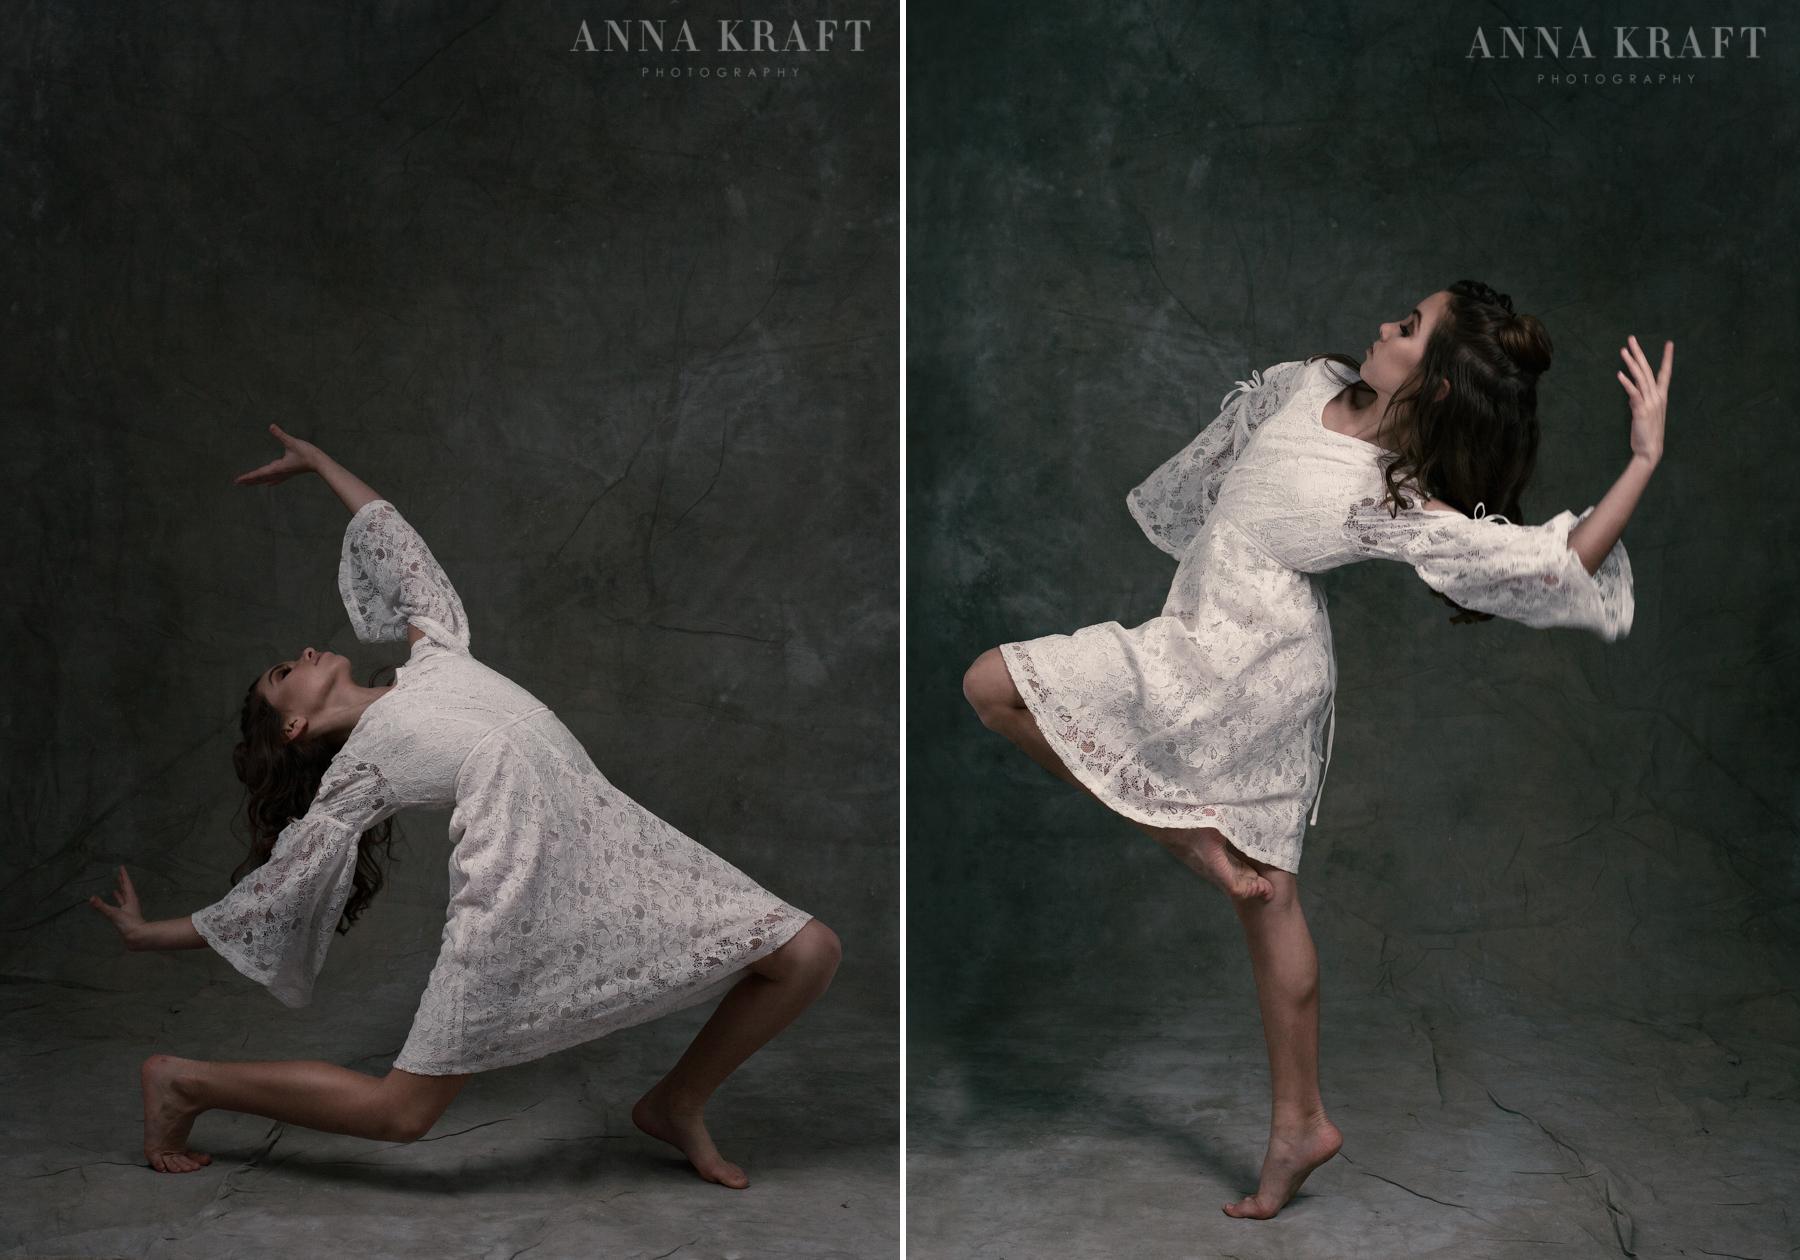 anna_kraft_photography_georgetown_square_studio_dance_inspired_portrait.jpg